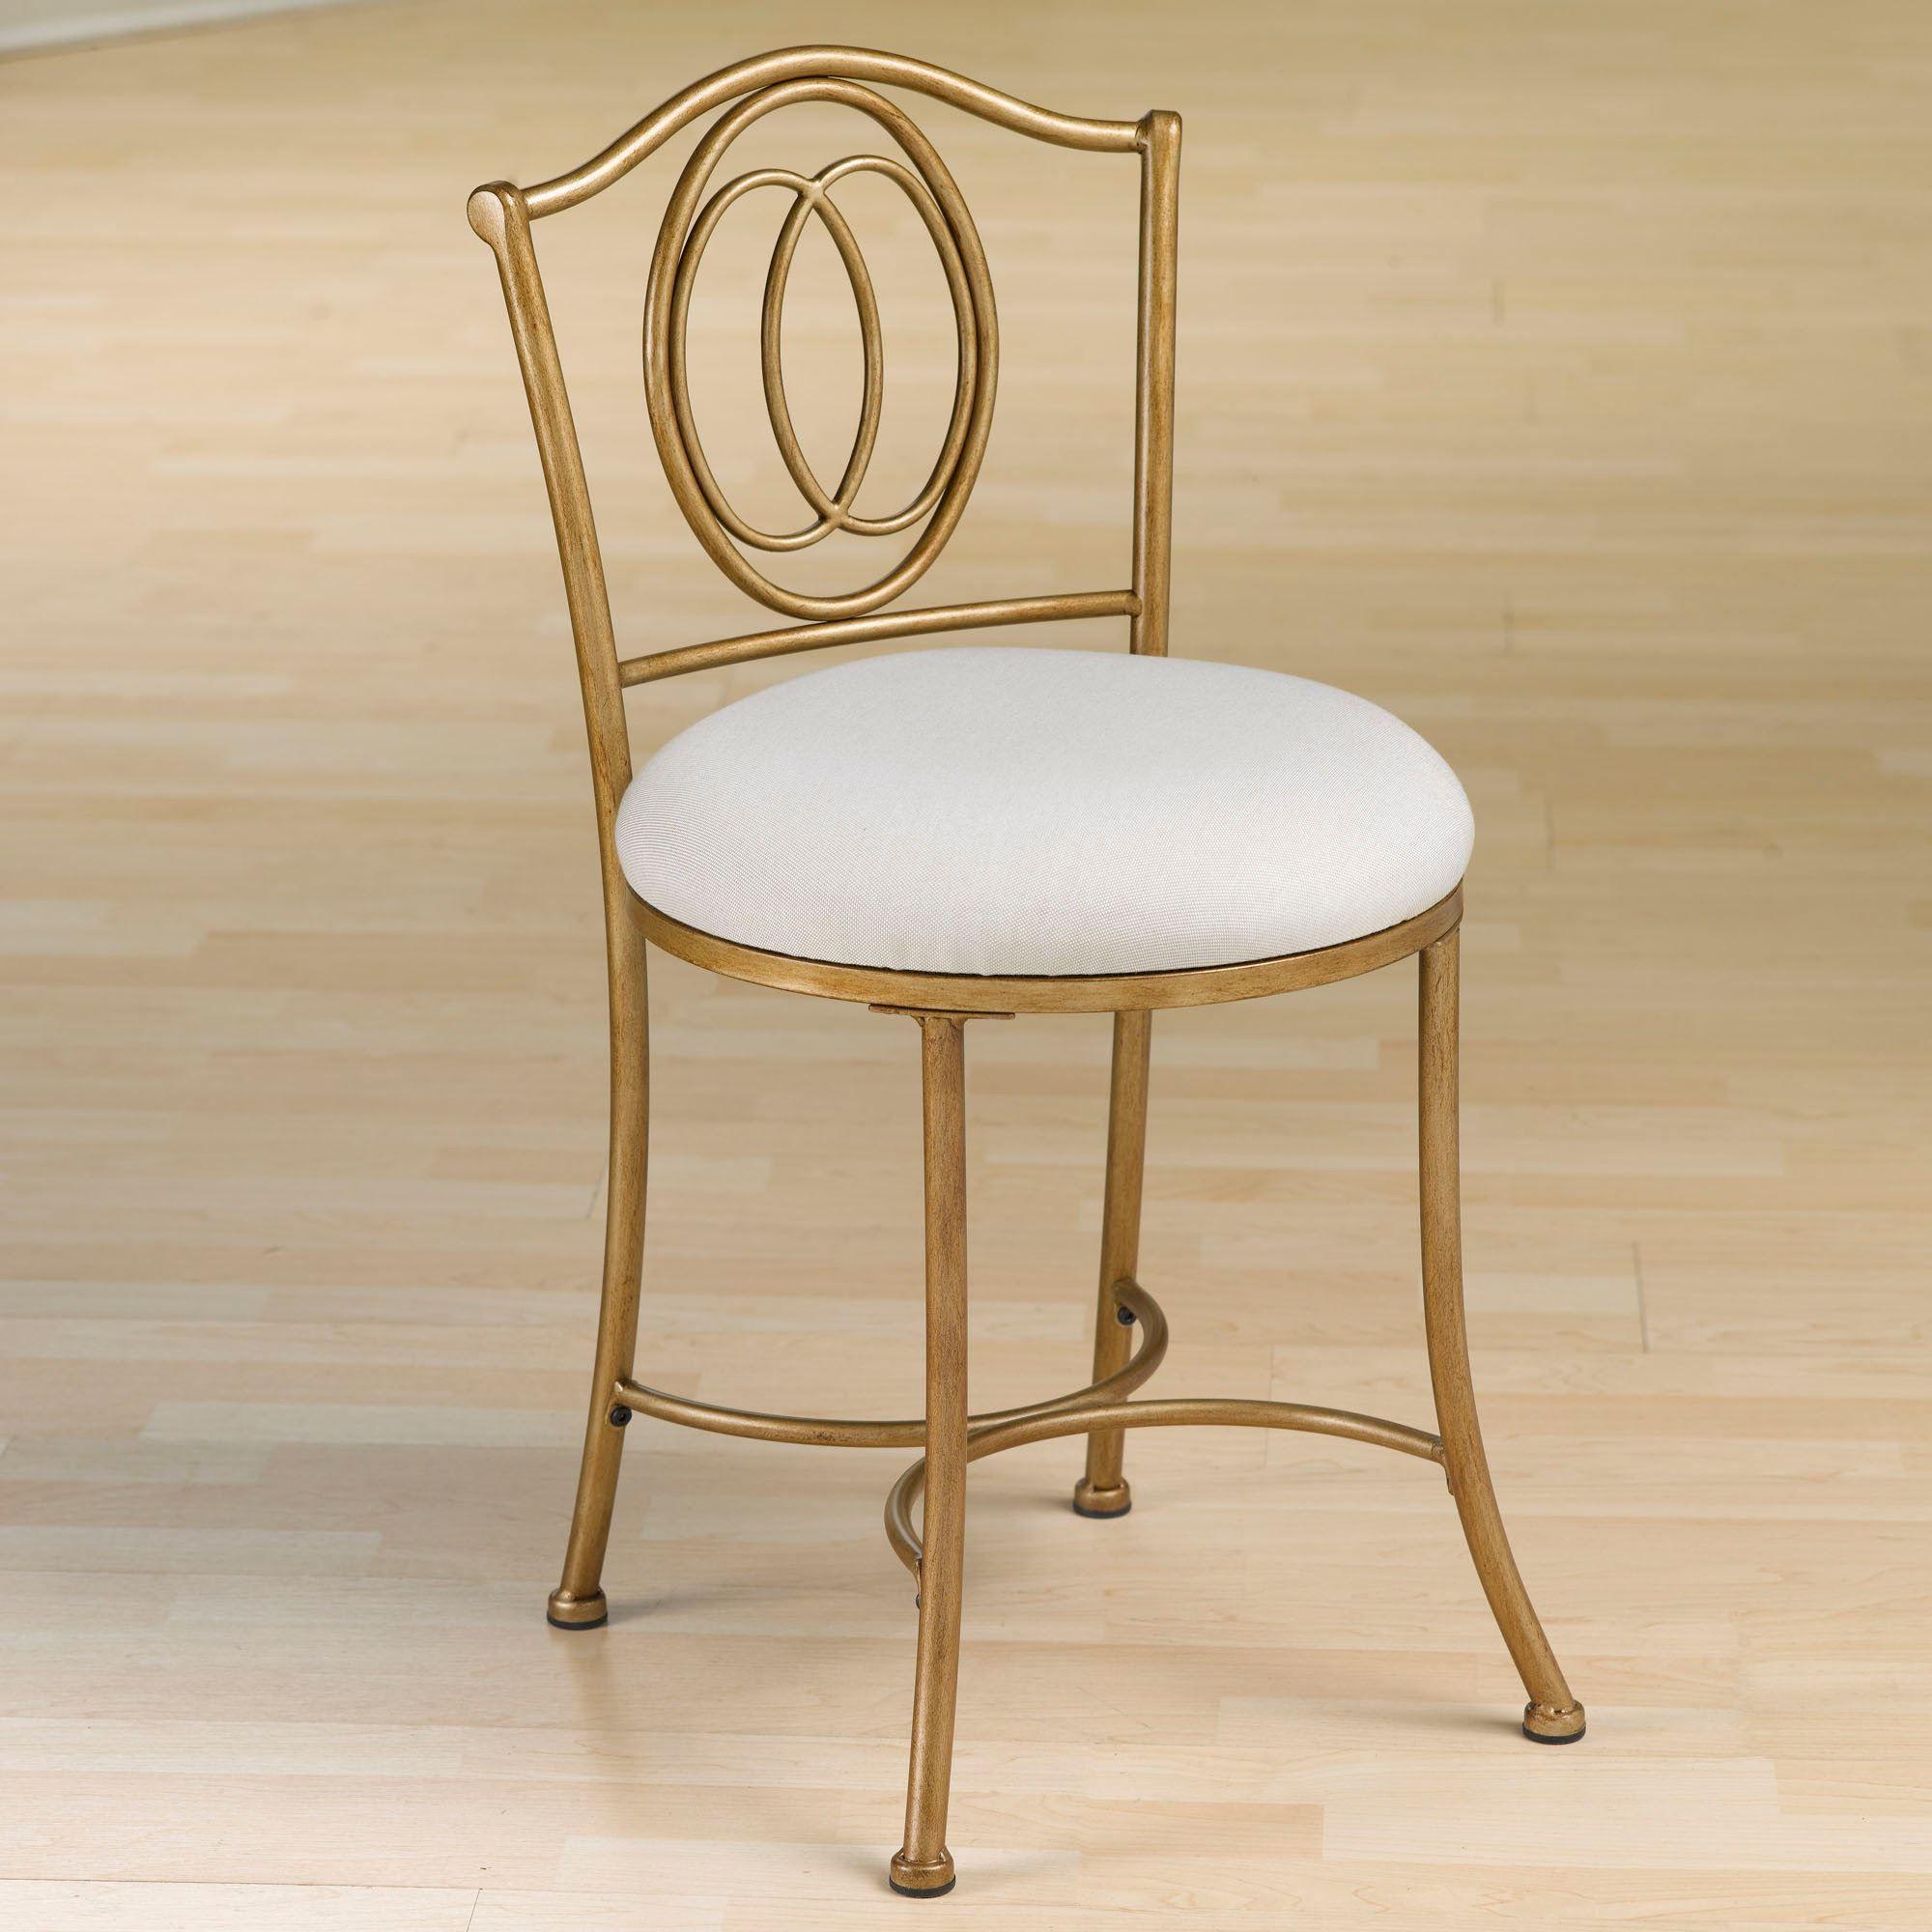 Bathroom Vanity Chairs With Backs Hocker Stuhle Und Schminktisch